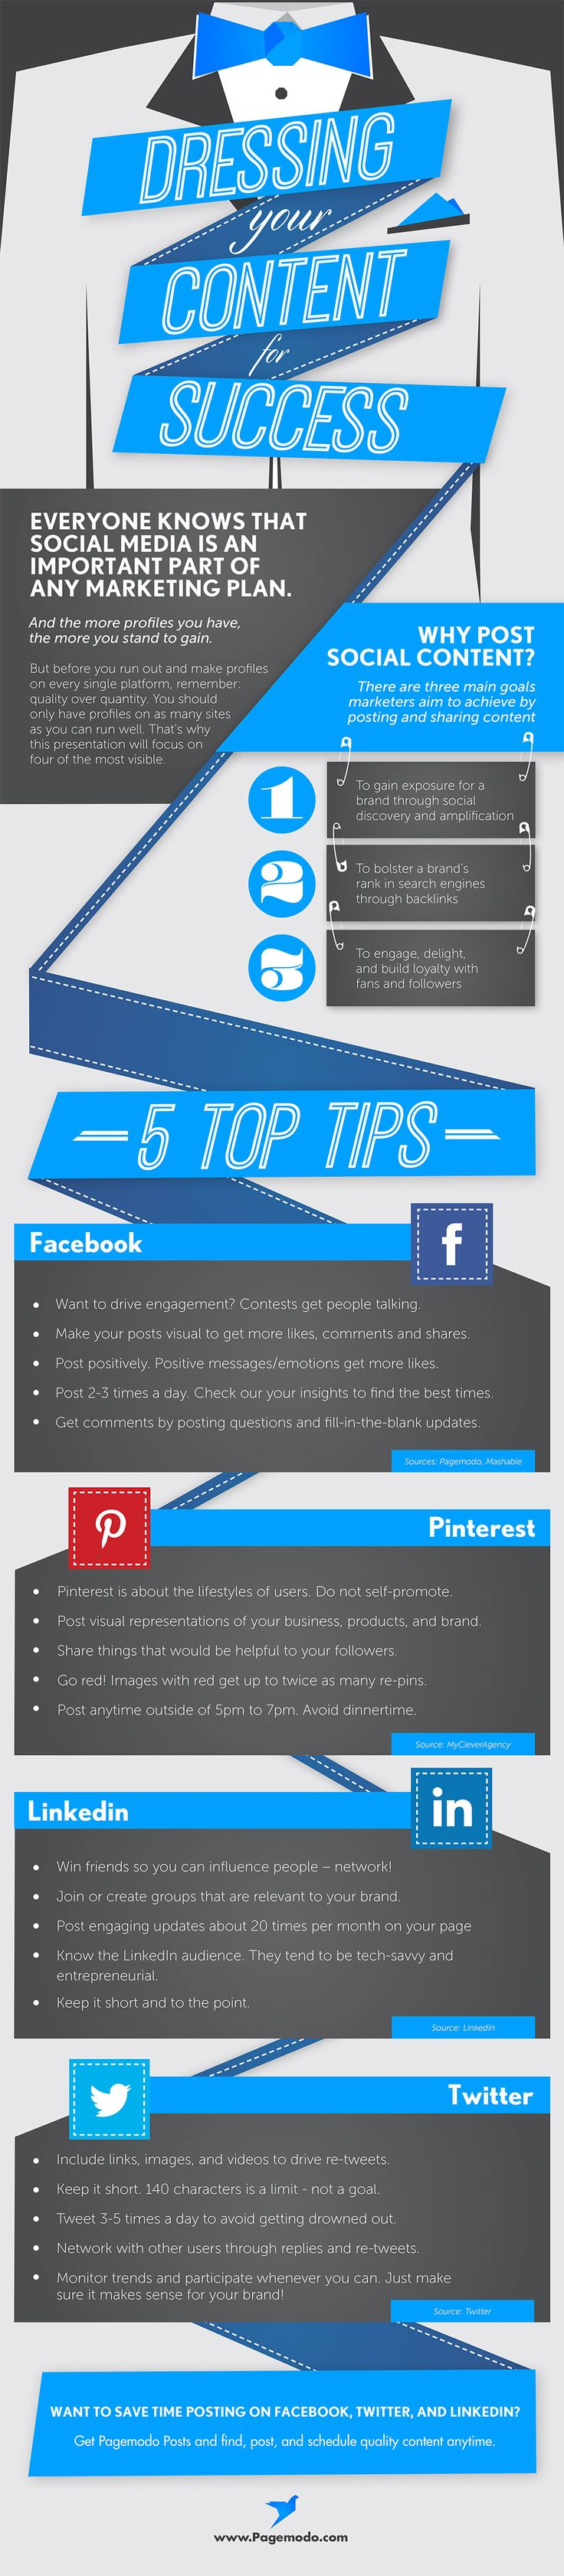 Dressing your #SocialMedia Content for Success - #infographic #contentmarketing